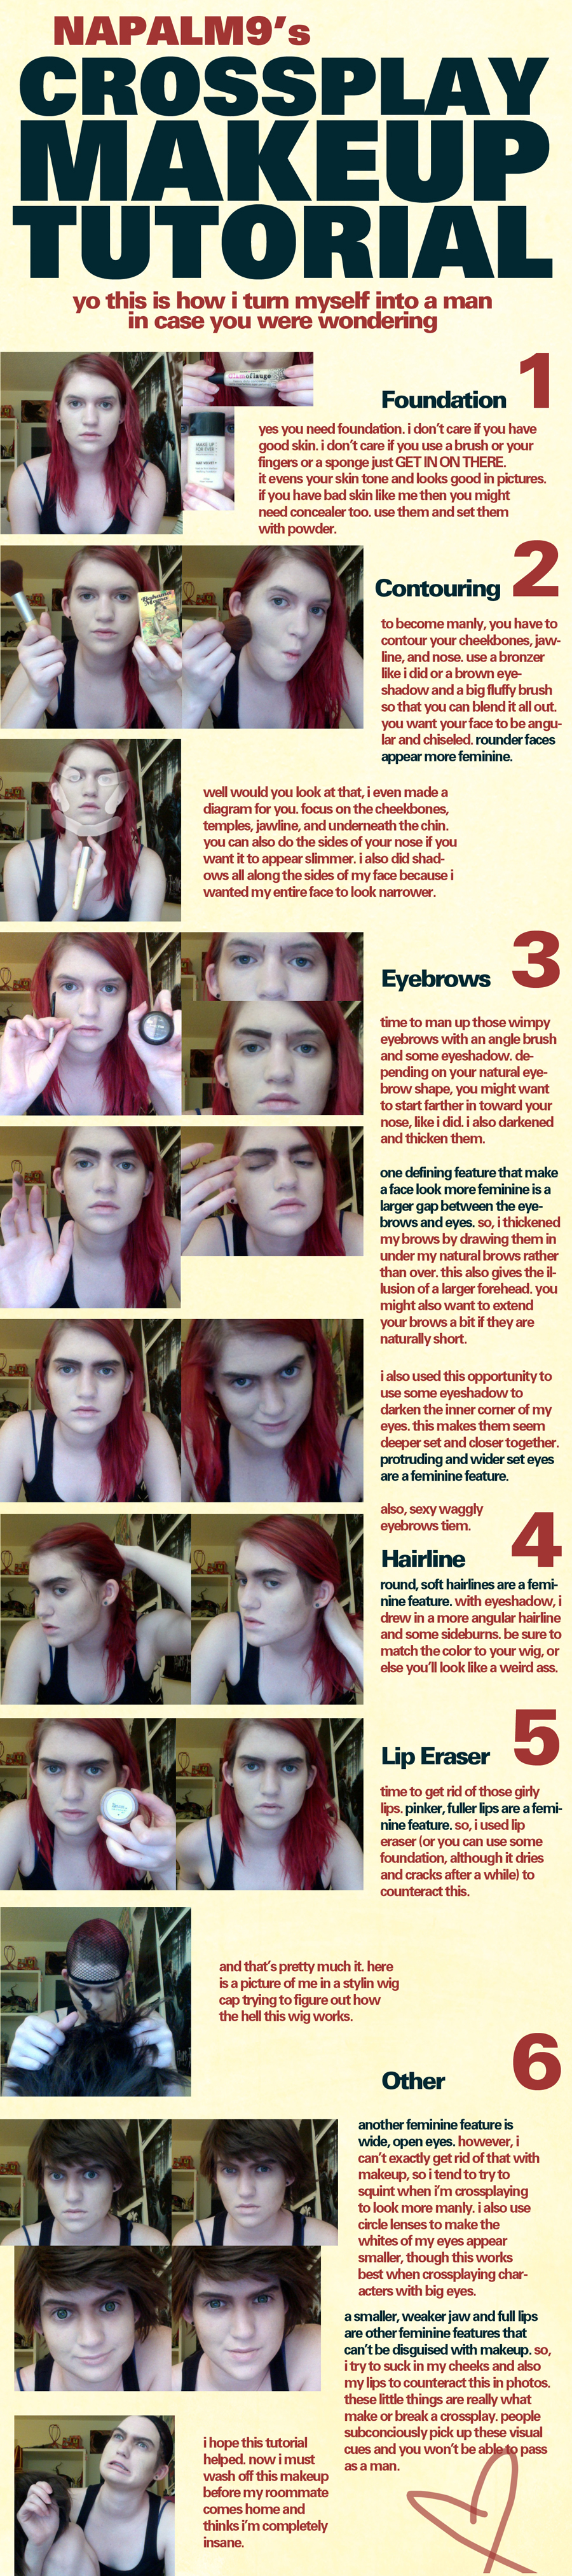 Crossplay Makeup Tutorial by napallama